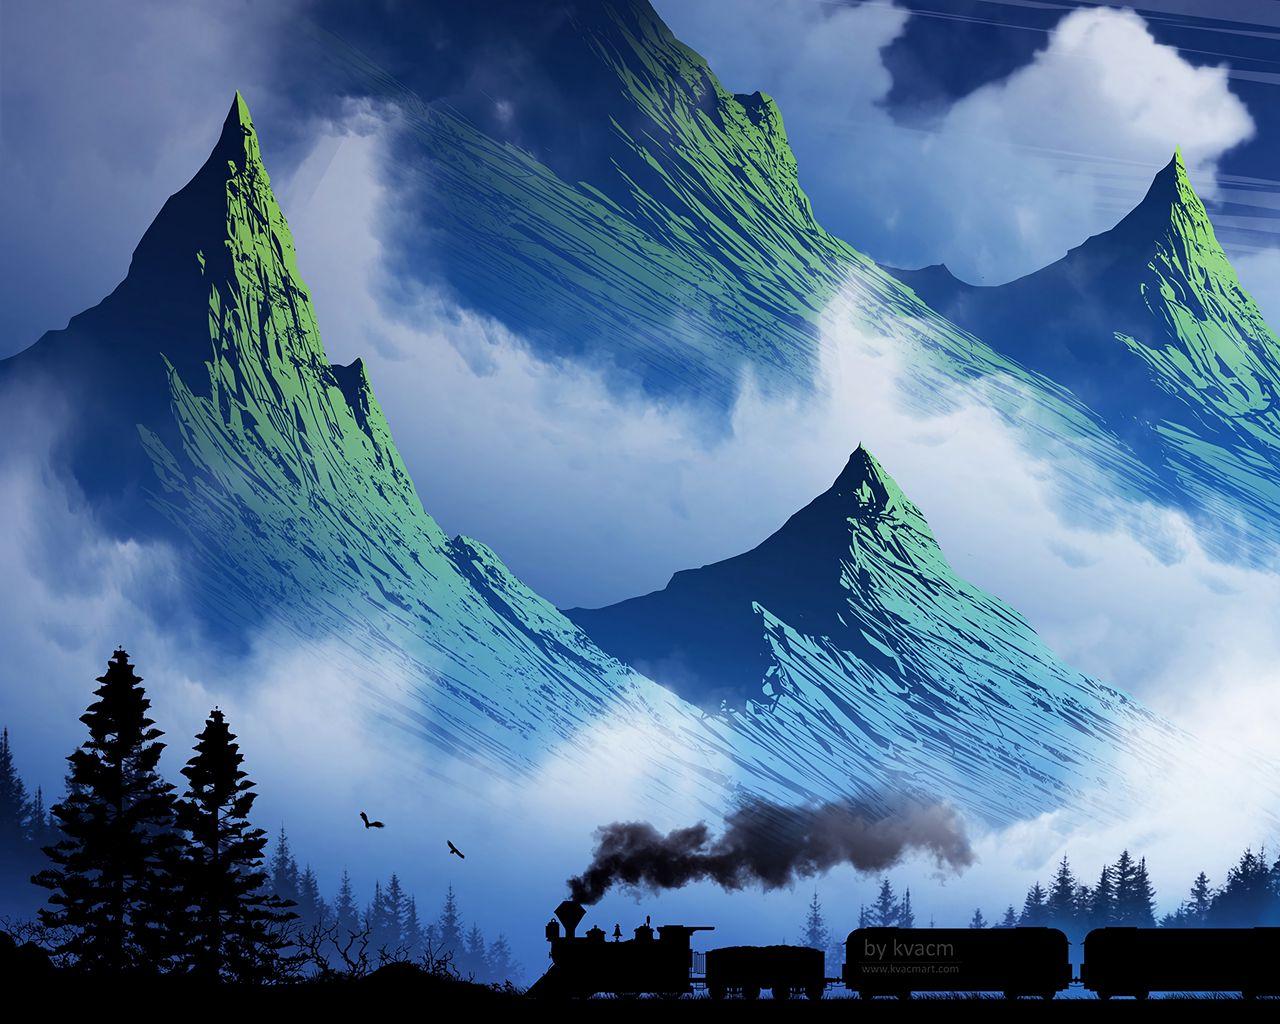 1280x1024 Wallpaper train, mountains, art, fog, smoke